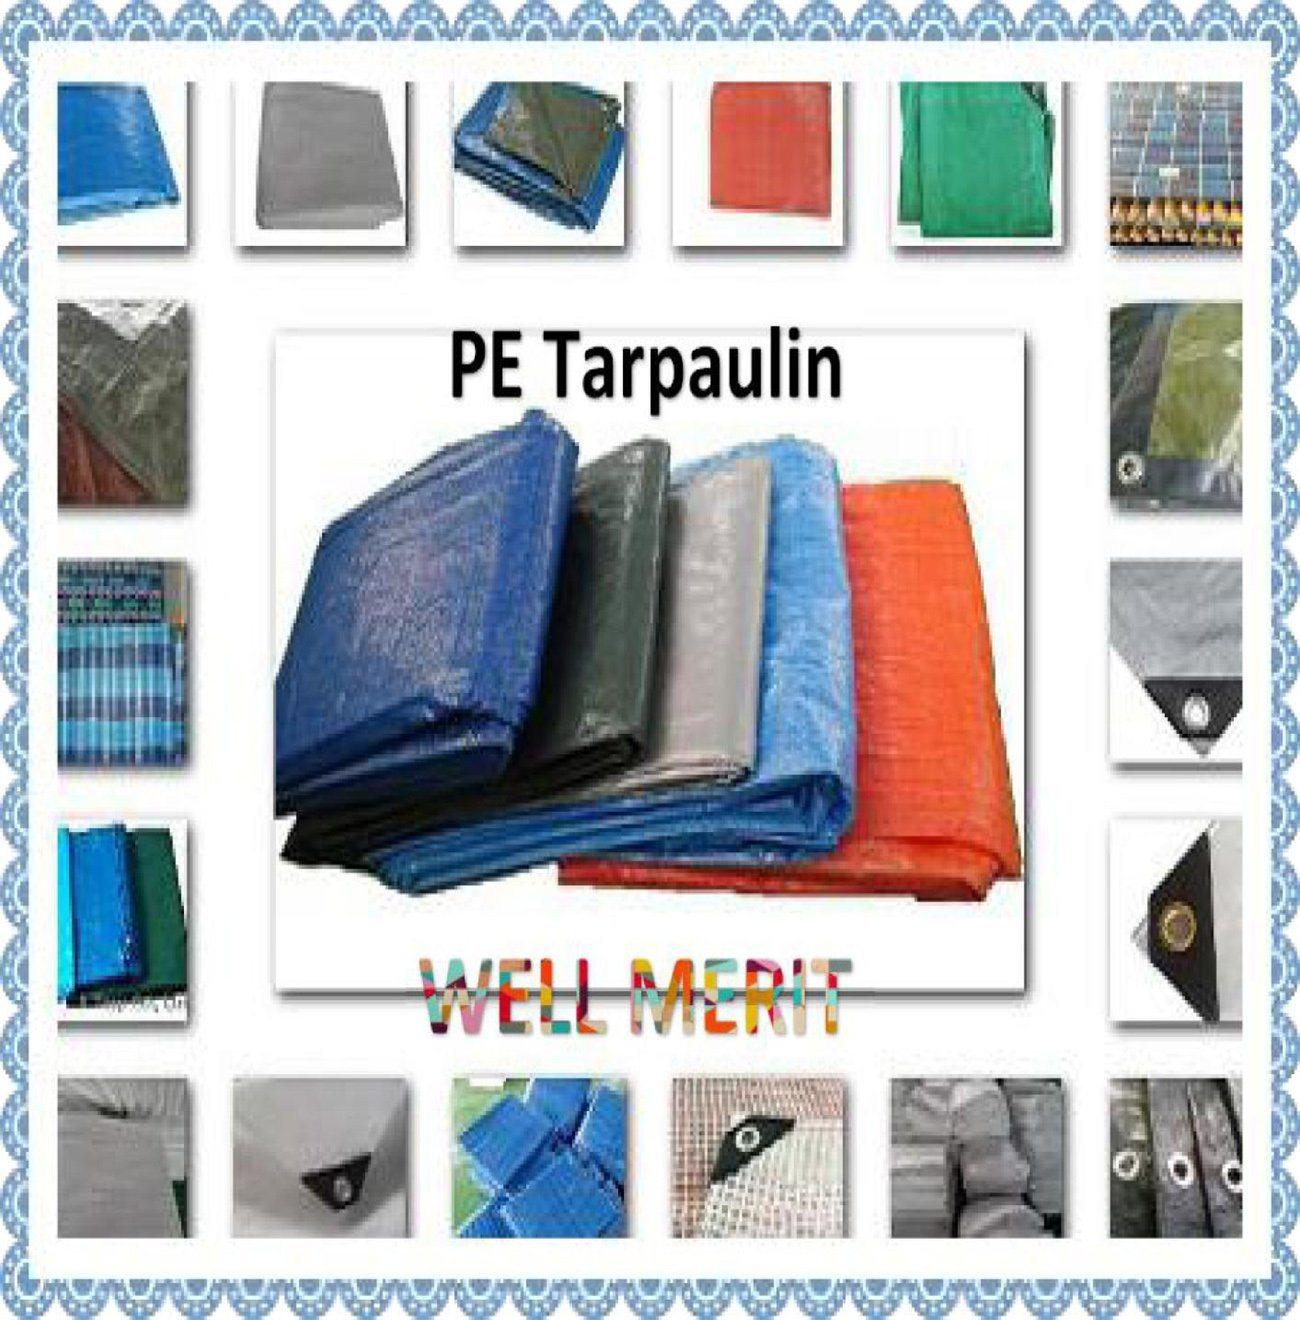 60GSM-300GSM PE Tarpaulin Poly Tarp Plastic Sheet Truck Cover Tarpaulin